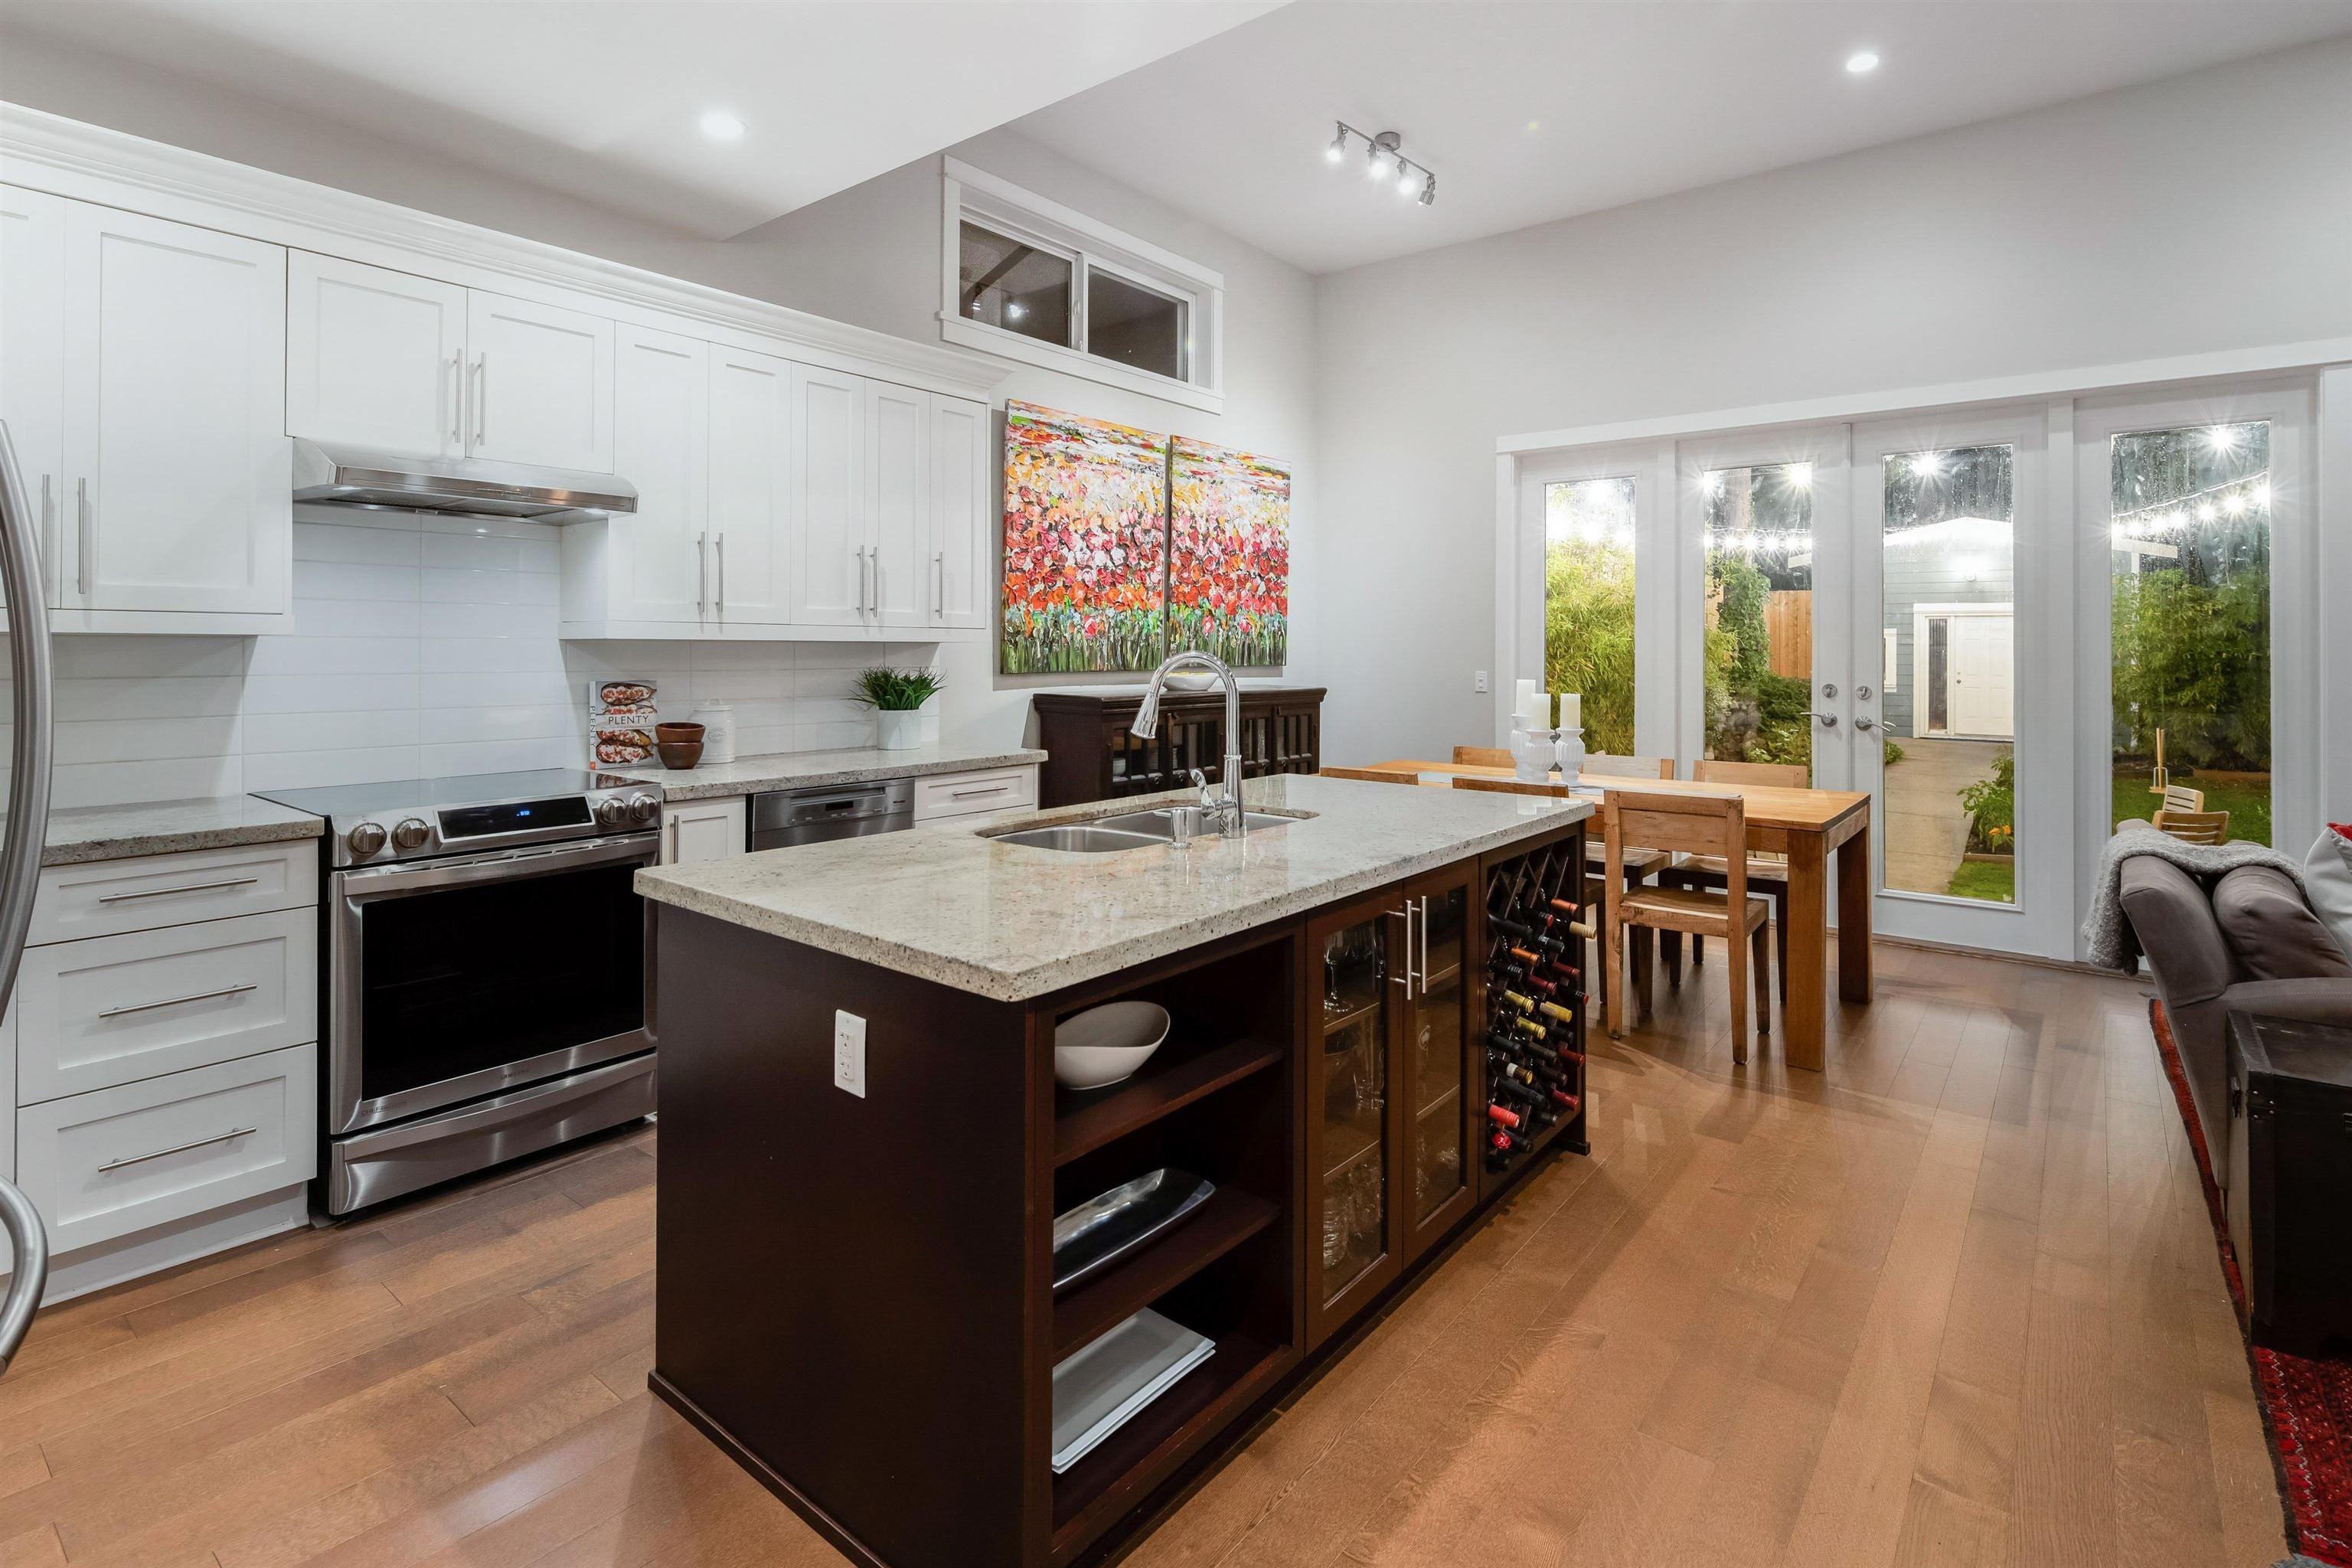 2258 WINDRIDGE DRIVE - Seymour NV House/Single Family for sale, 5 Bedrooms (R2617156) - #3